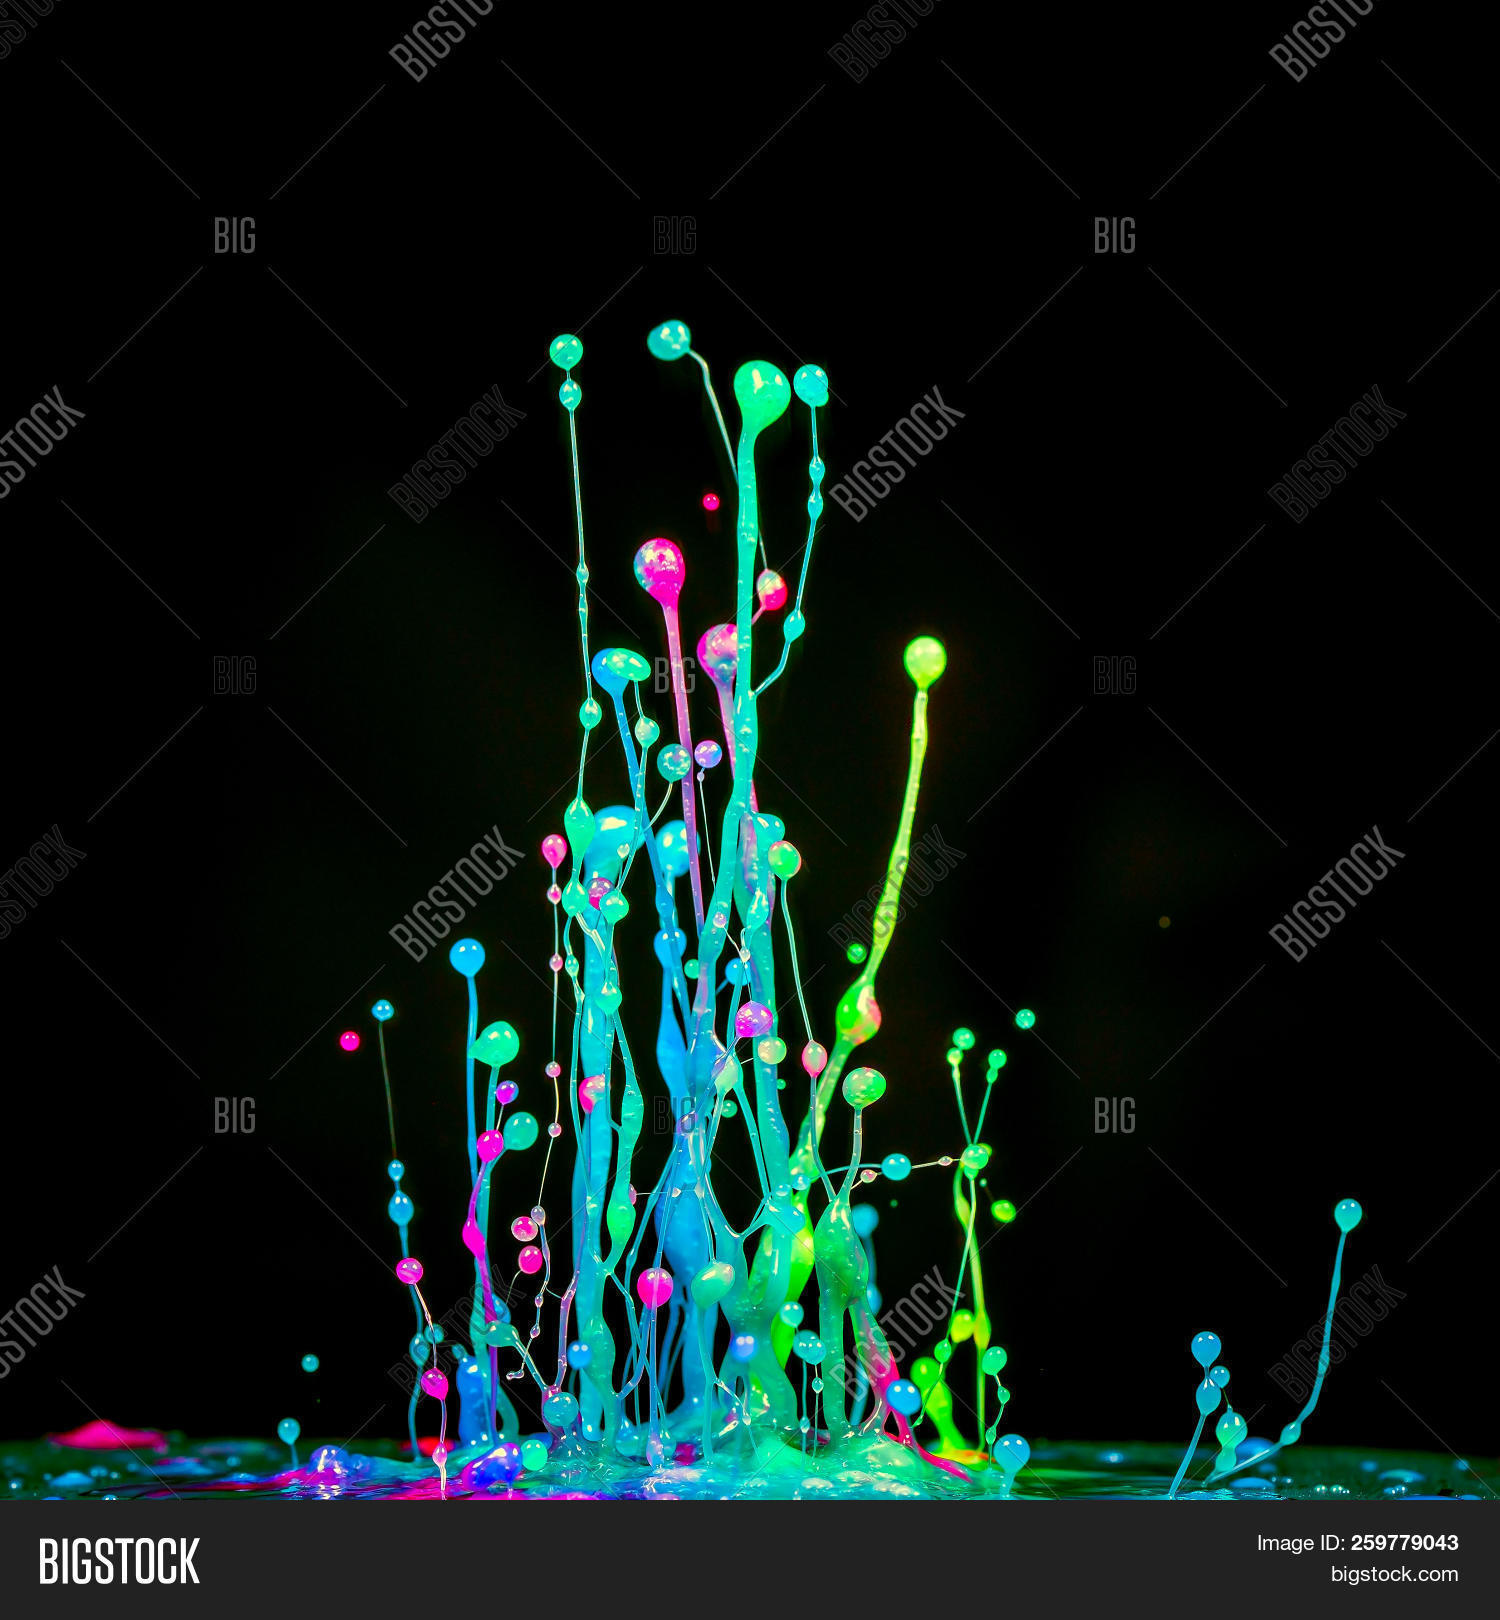 Splash Color Fluid Ink Image Photo Free Trial Bigstock